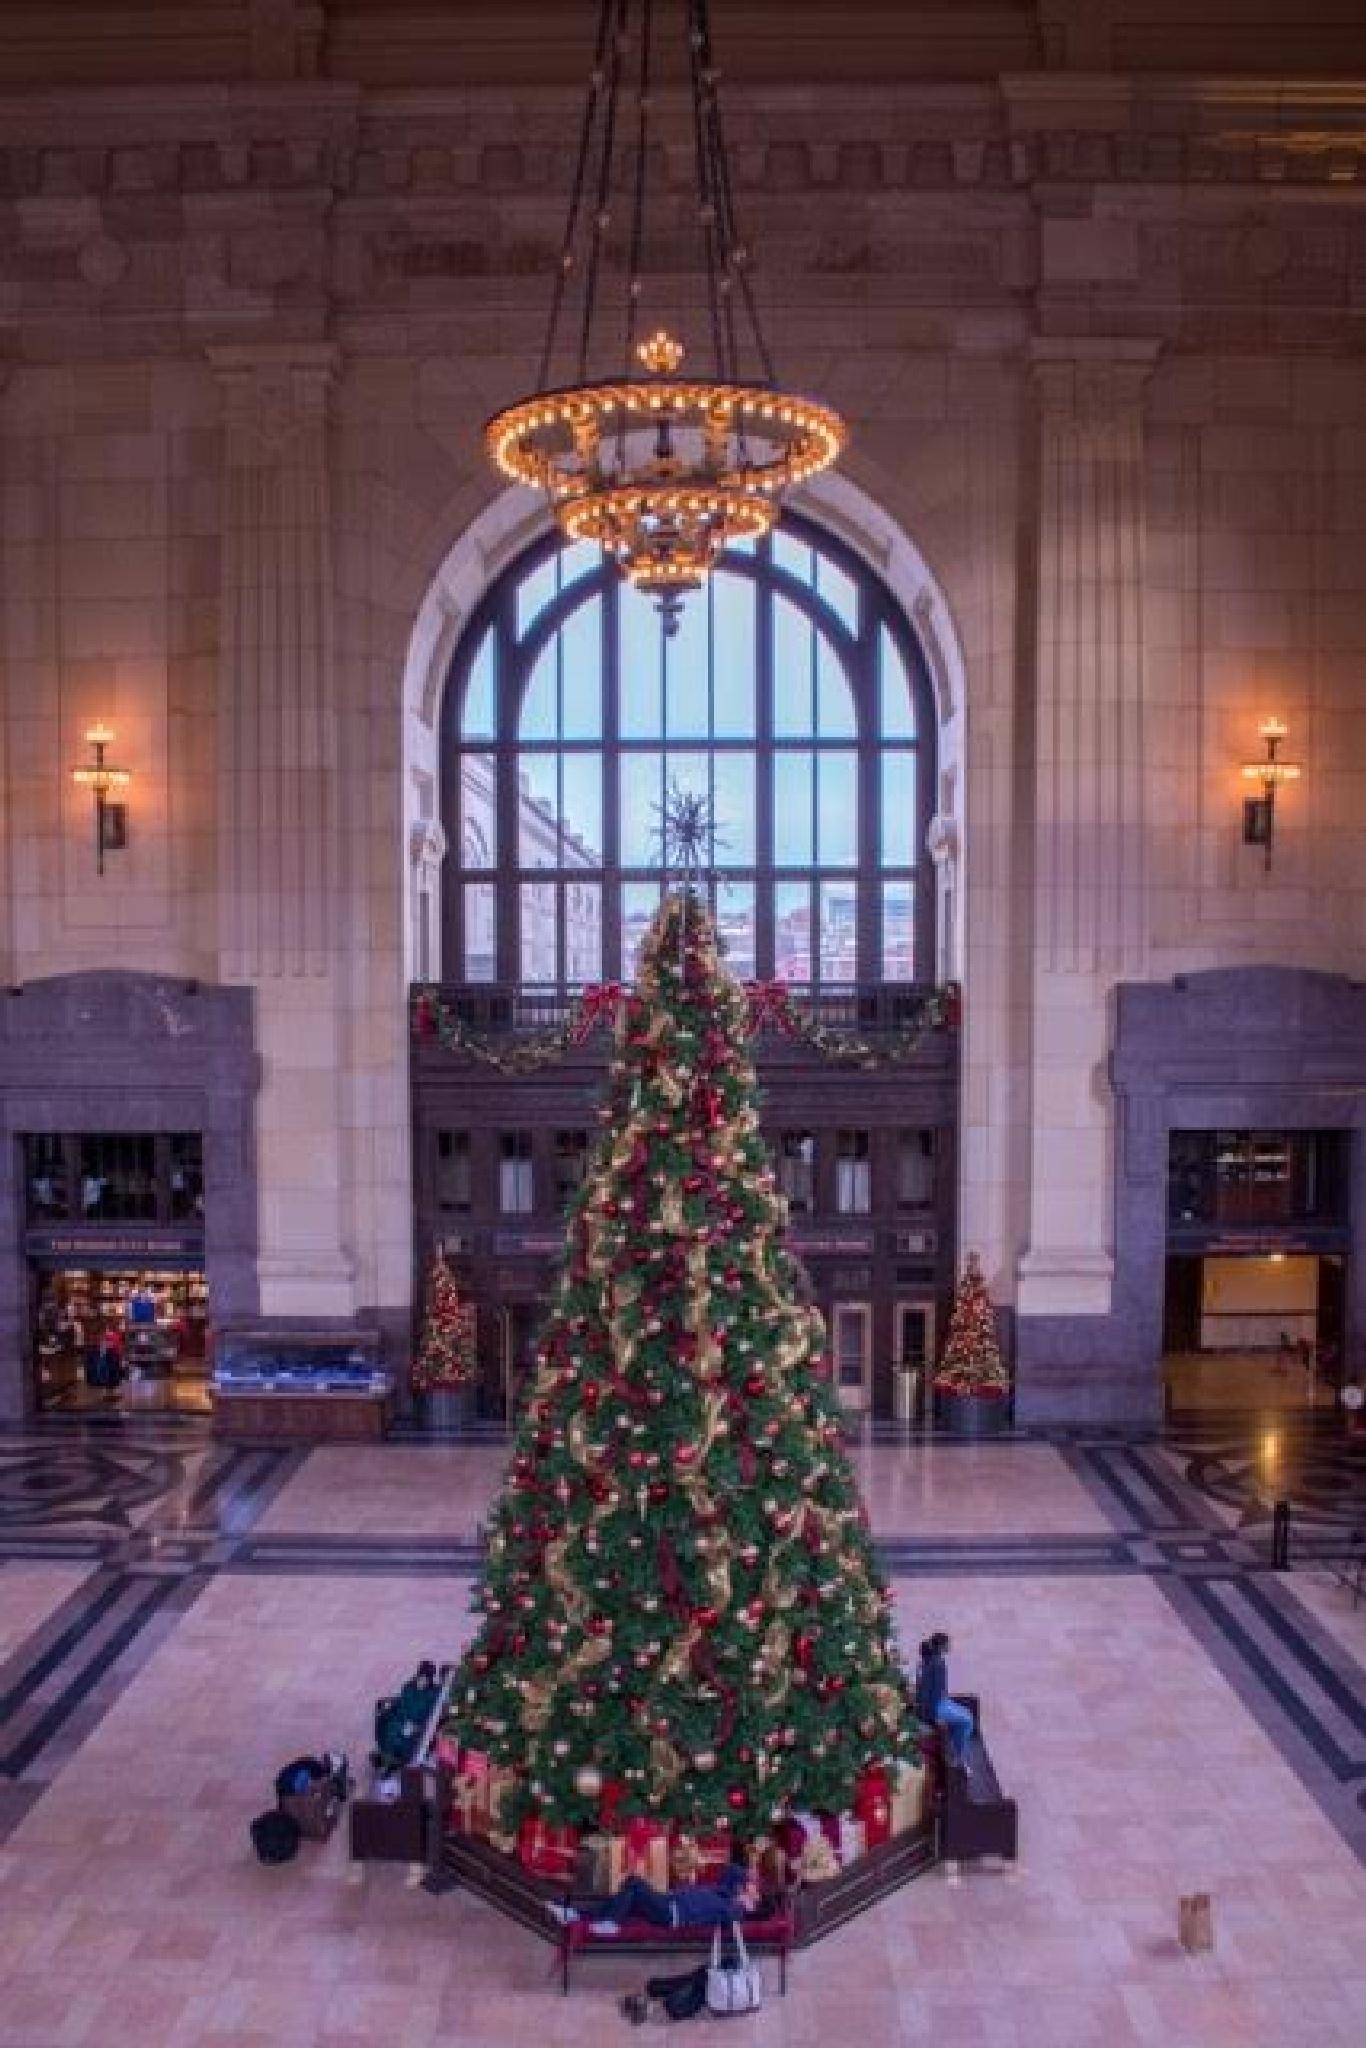 Union Station Christmas by Martyn Howgill